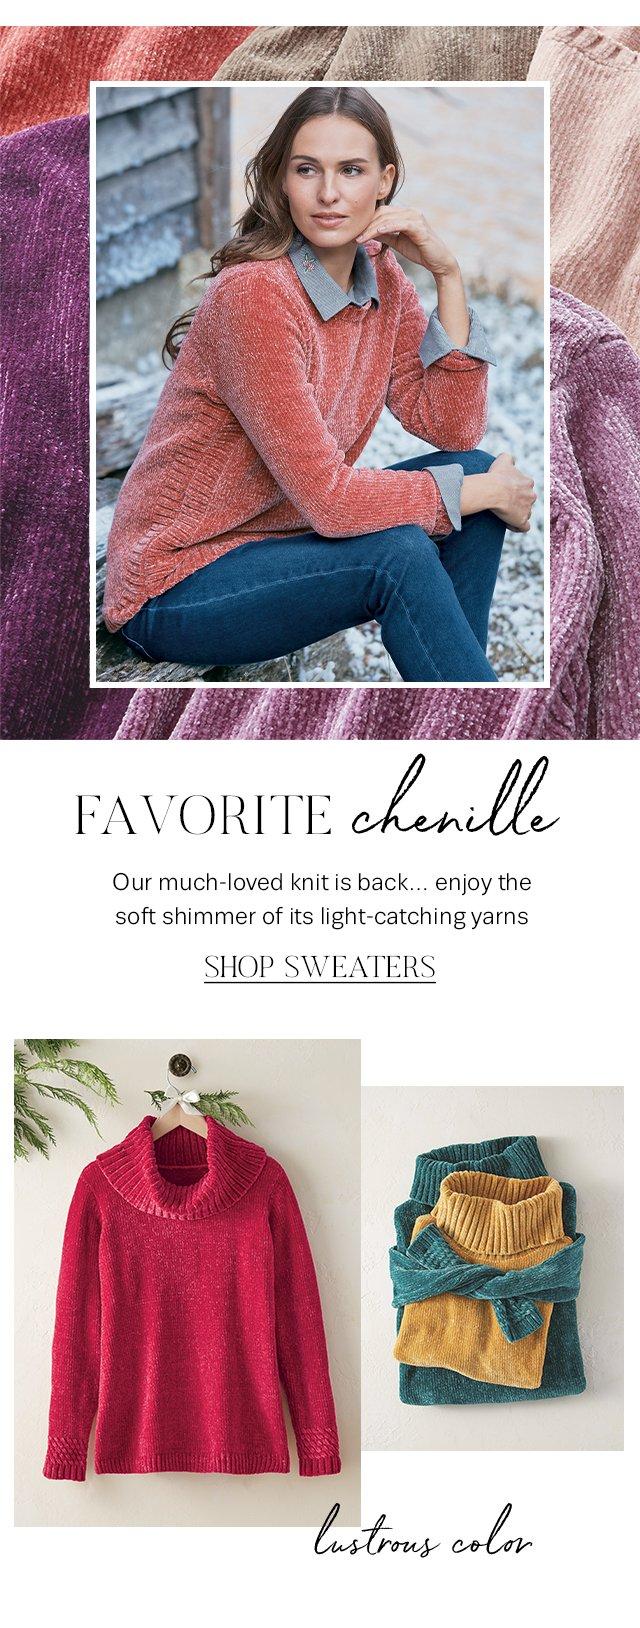 Shop the favorite chenille knit.